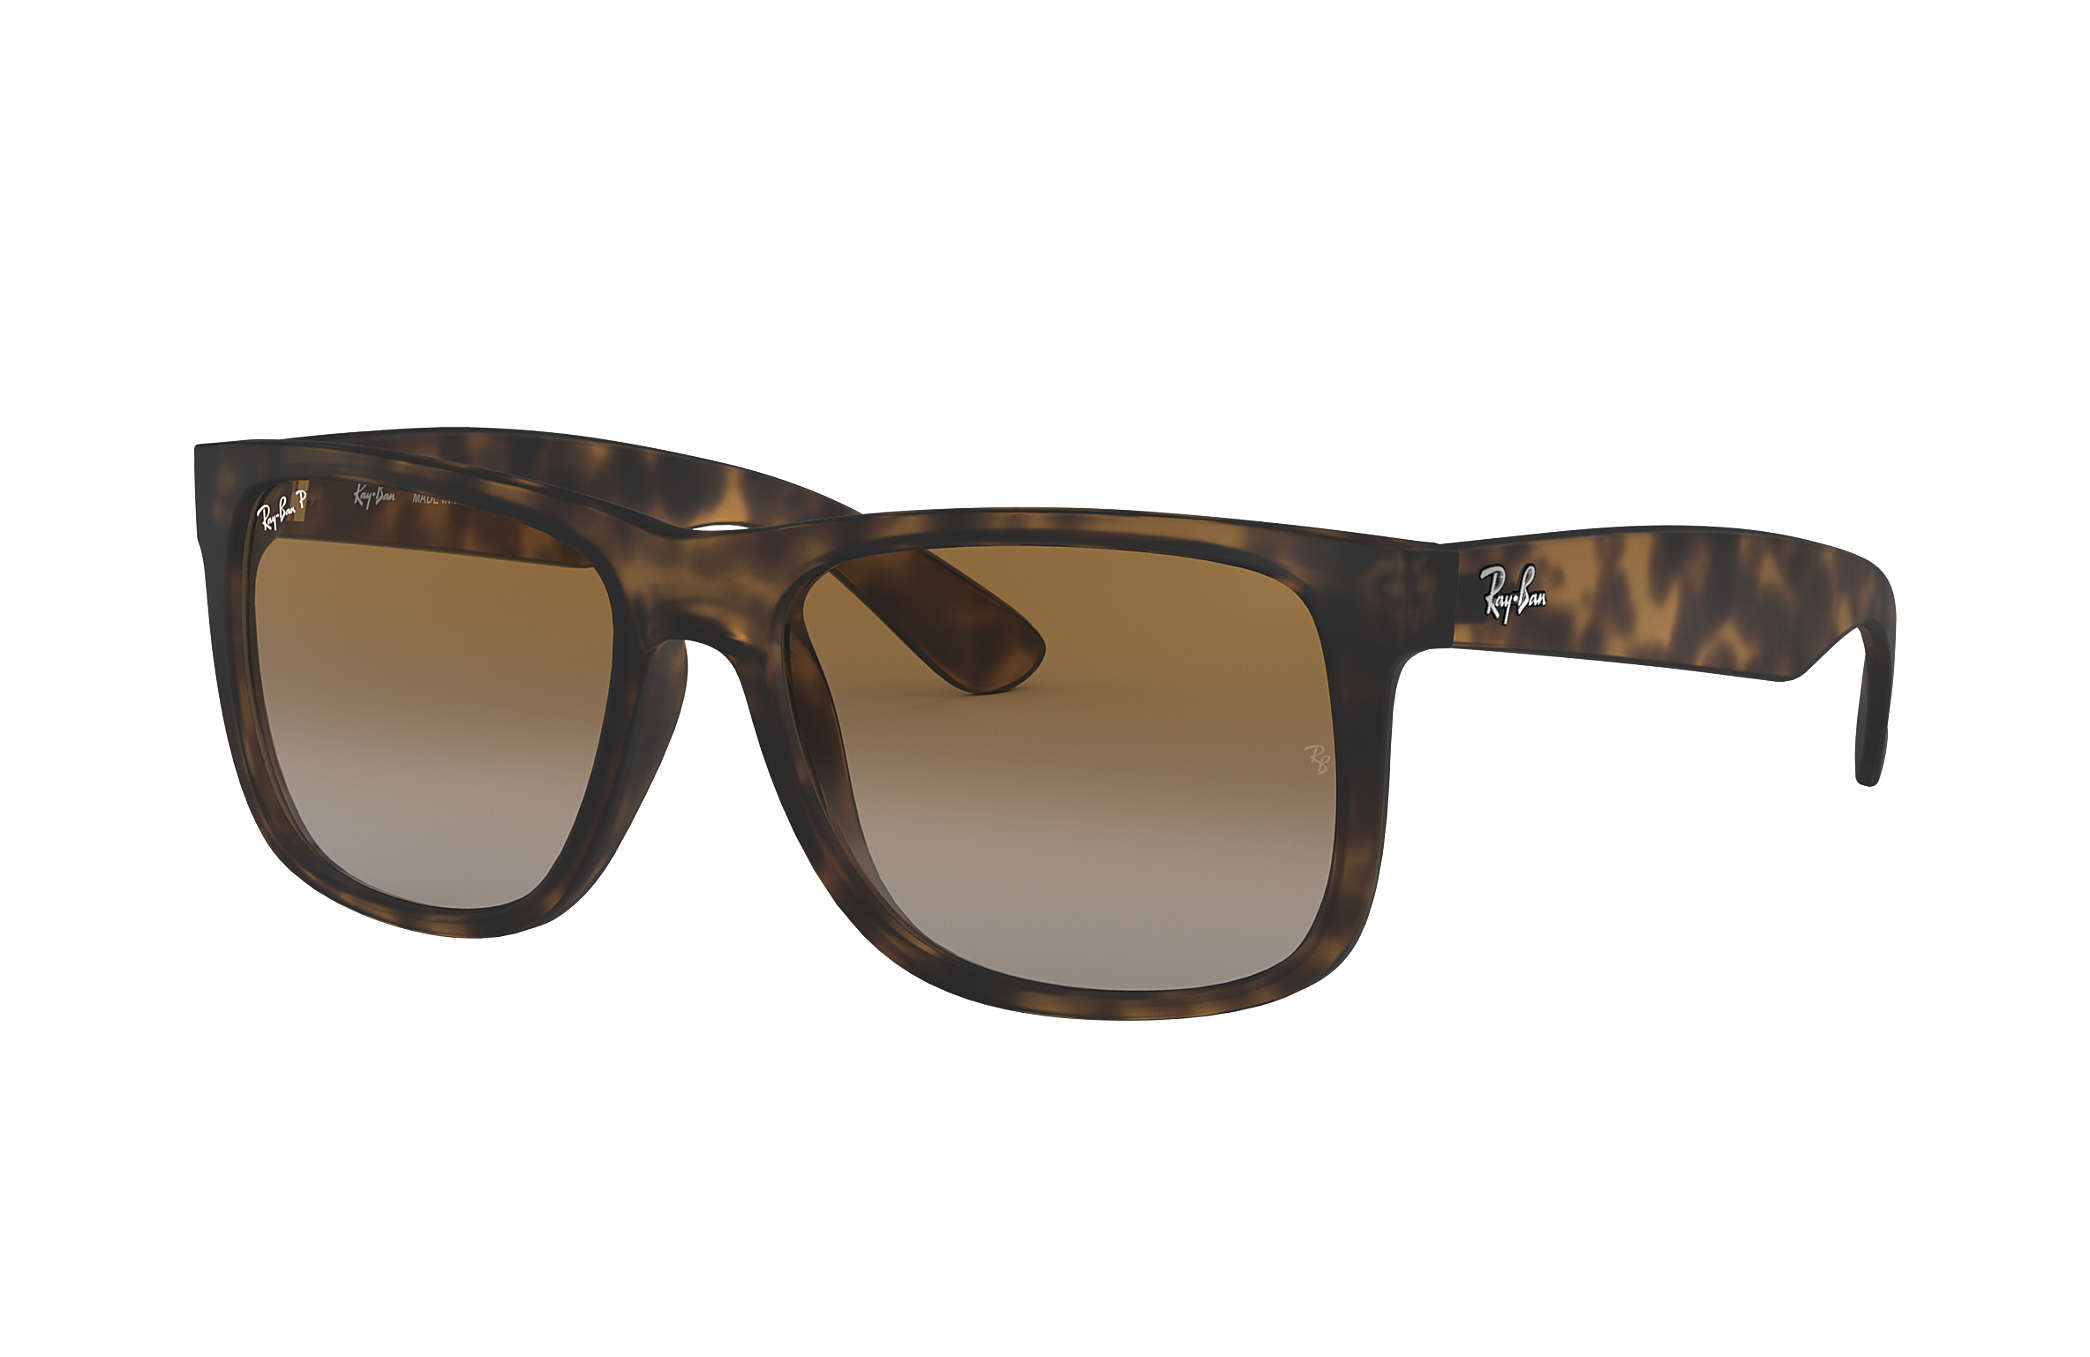 9f5a56f839 Ray-Ban Justin Classic RB4165 Tortoise - Nylon - Brown Polarized ...